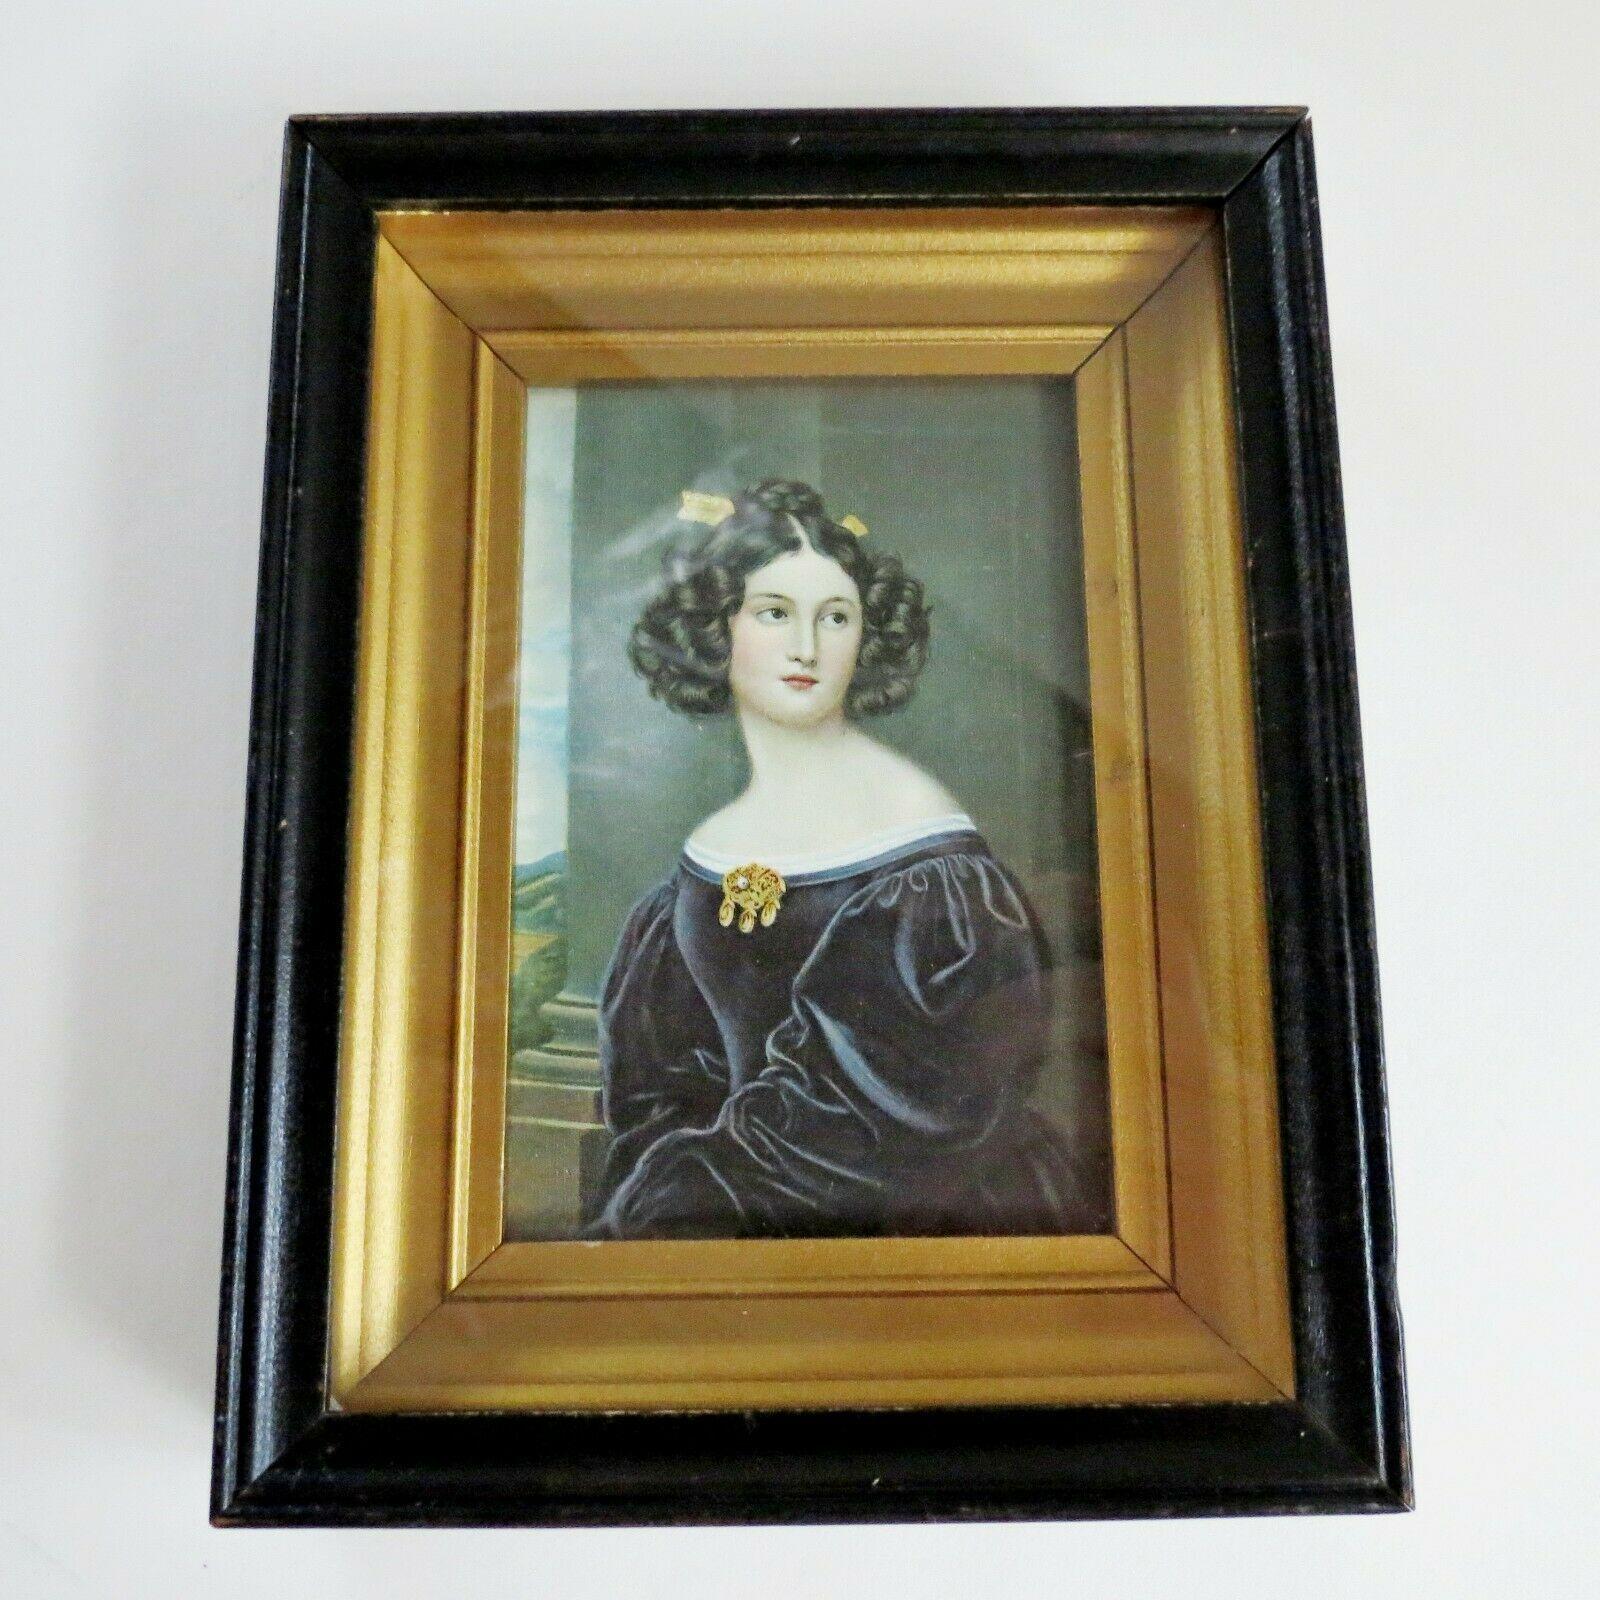 Antique Gold Frame behind glass lithograph Nanette Kaula - Joseph Karl Stieler